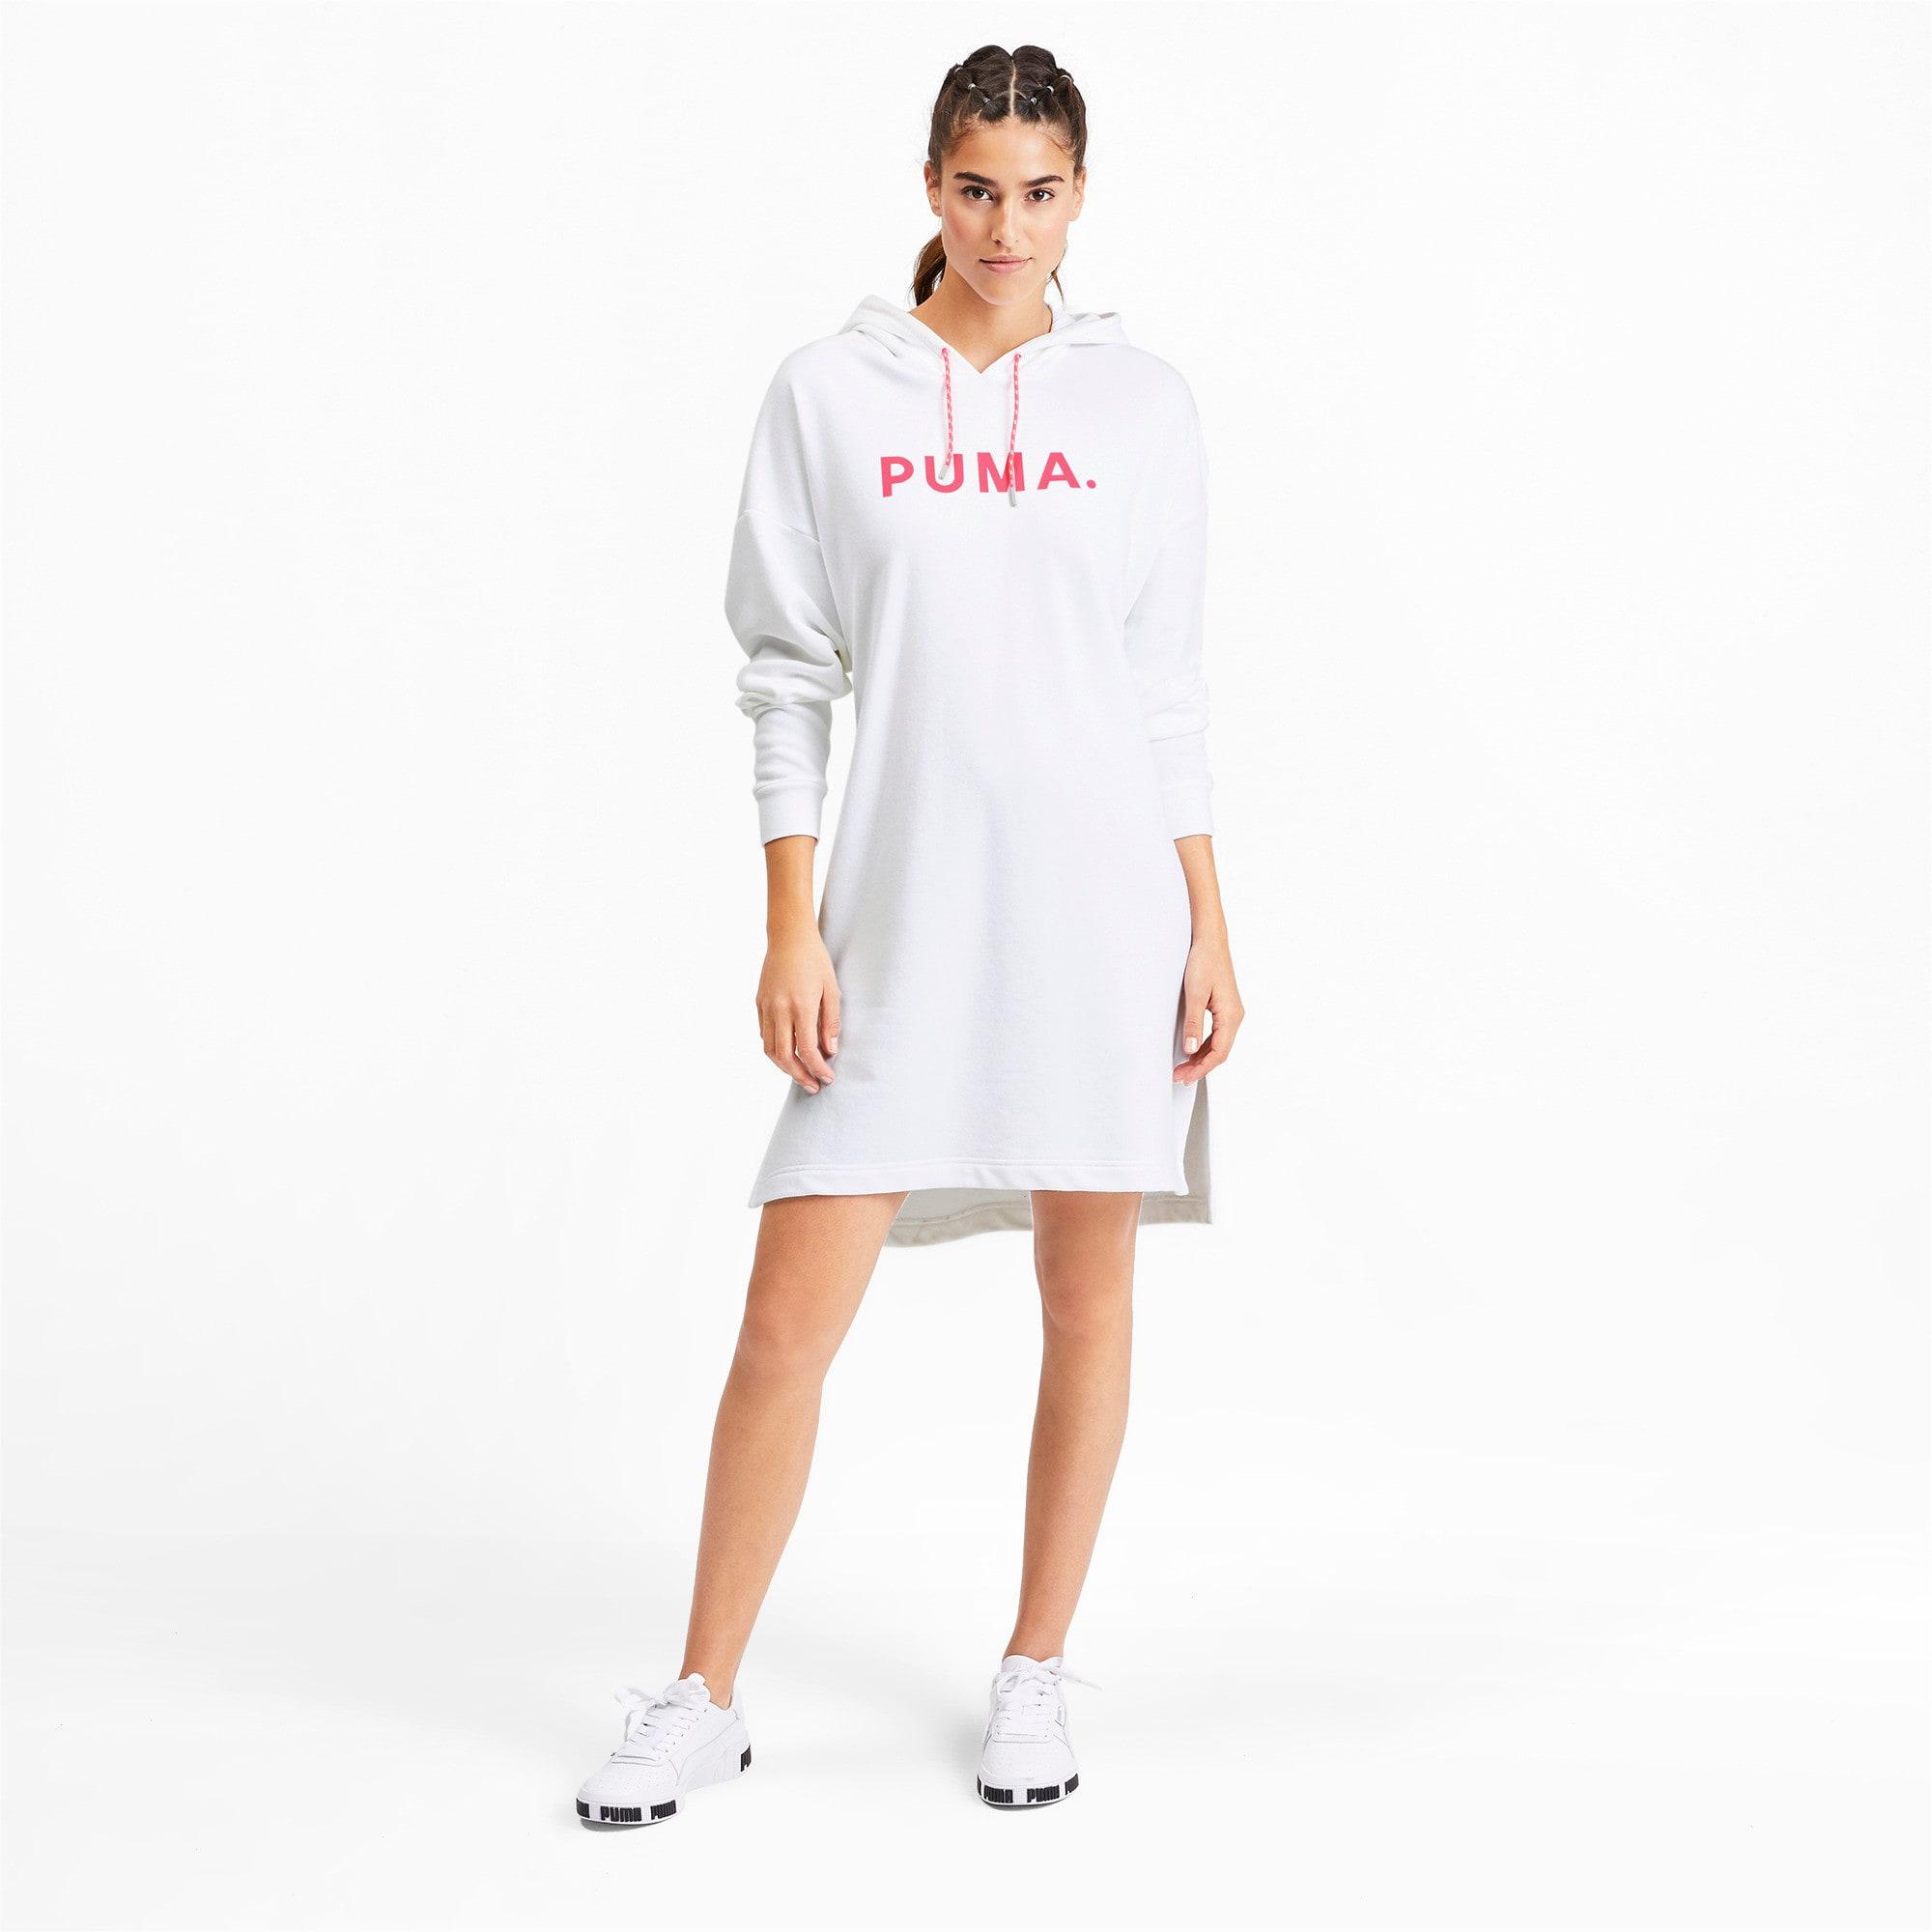 Thumbnail 4 of CHASE ウィメンズ フーデッドドレス, Puma White, medium-JPN